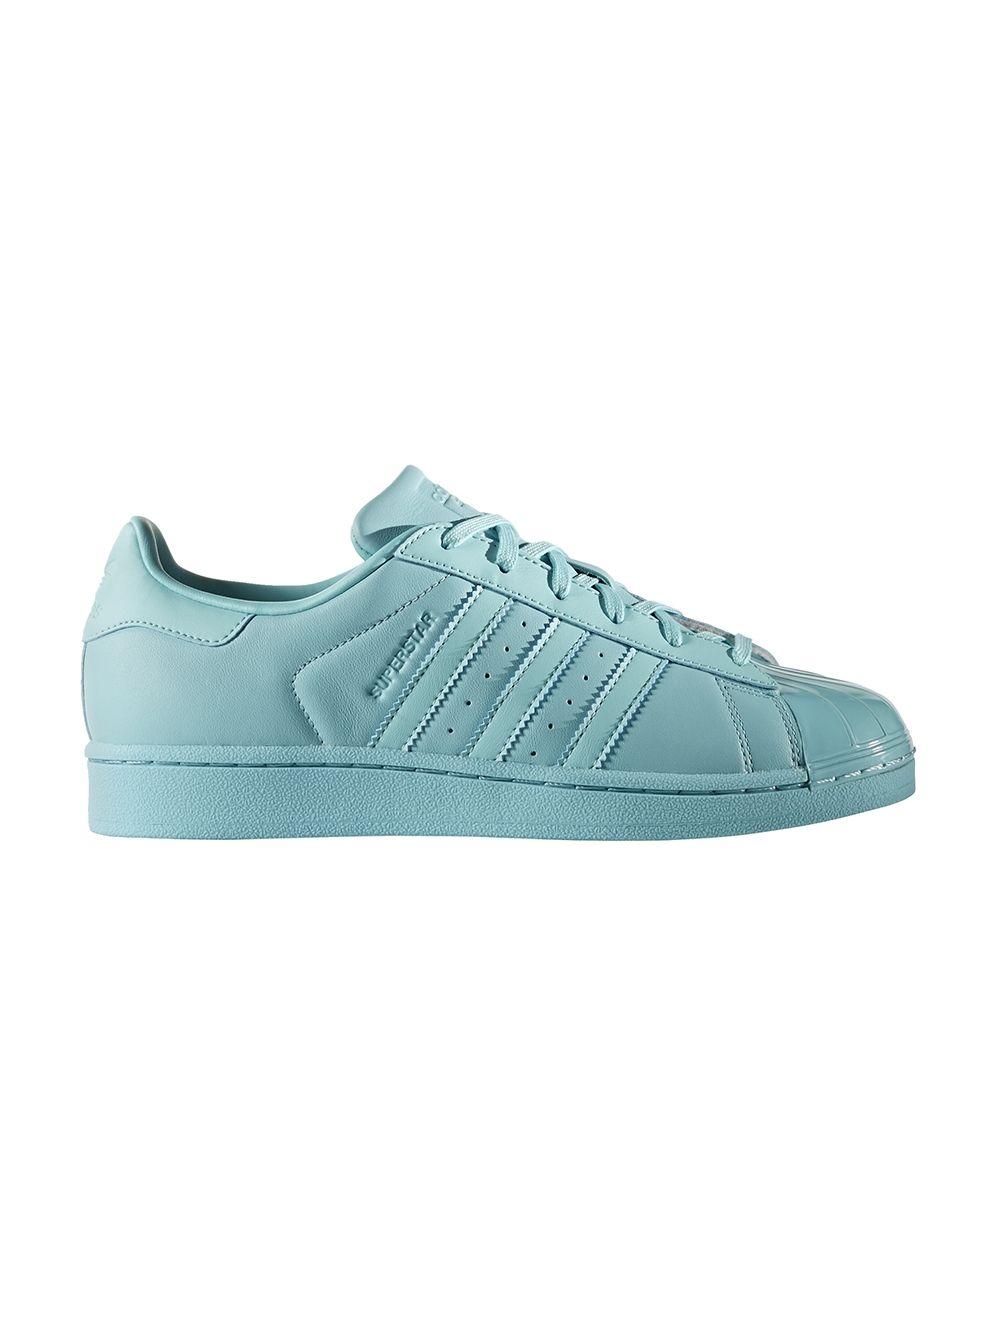 superstar adidas turquoise